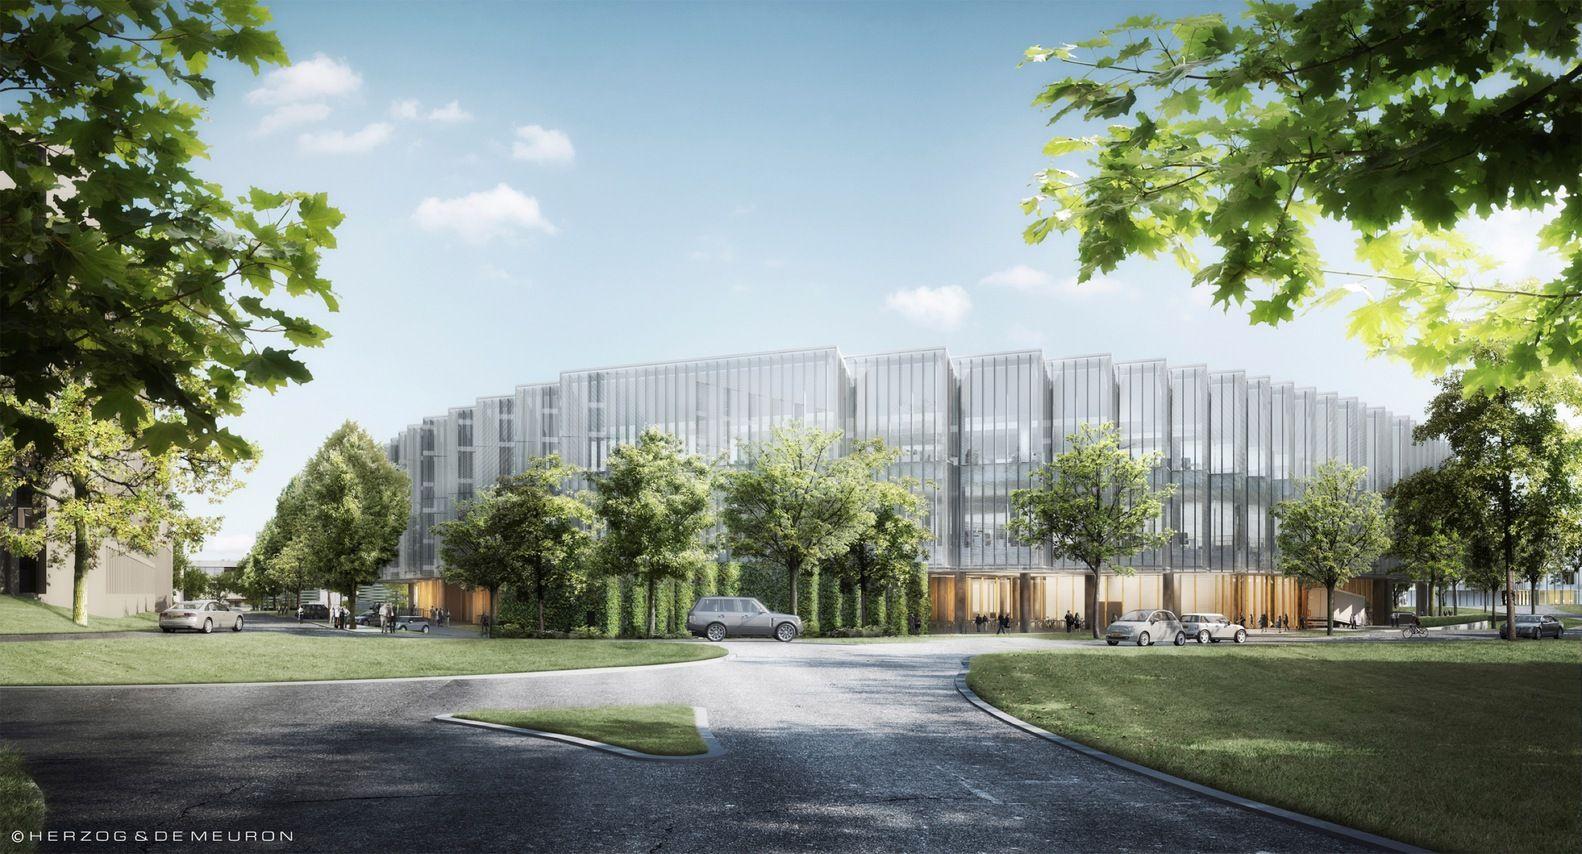 Gallery Of Herzog De Meuron S Astrazeneca R D Headquarters Tops Out In Cambridge 4 Architecture Visualization City Of Cambridge Cambridge